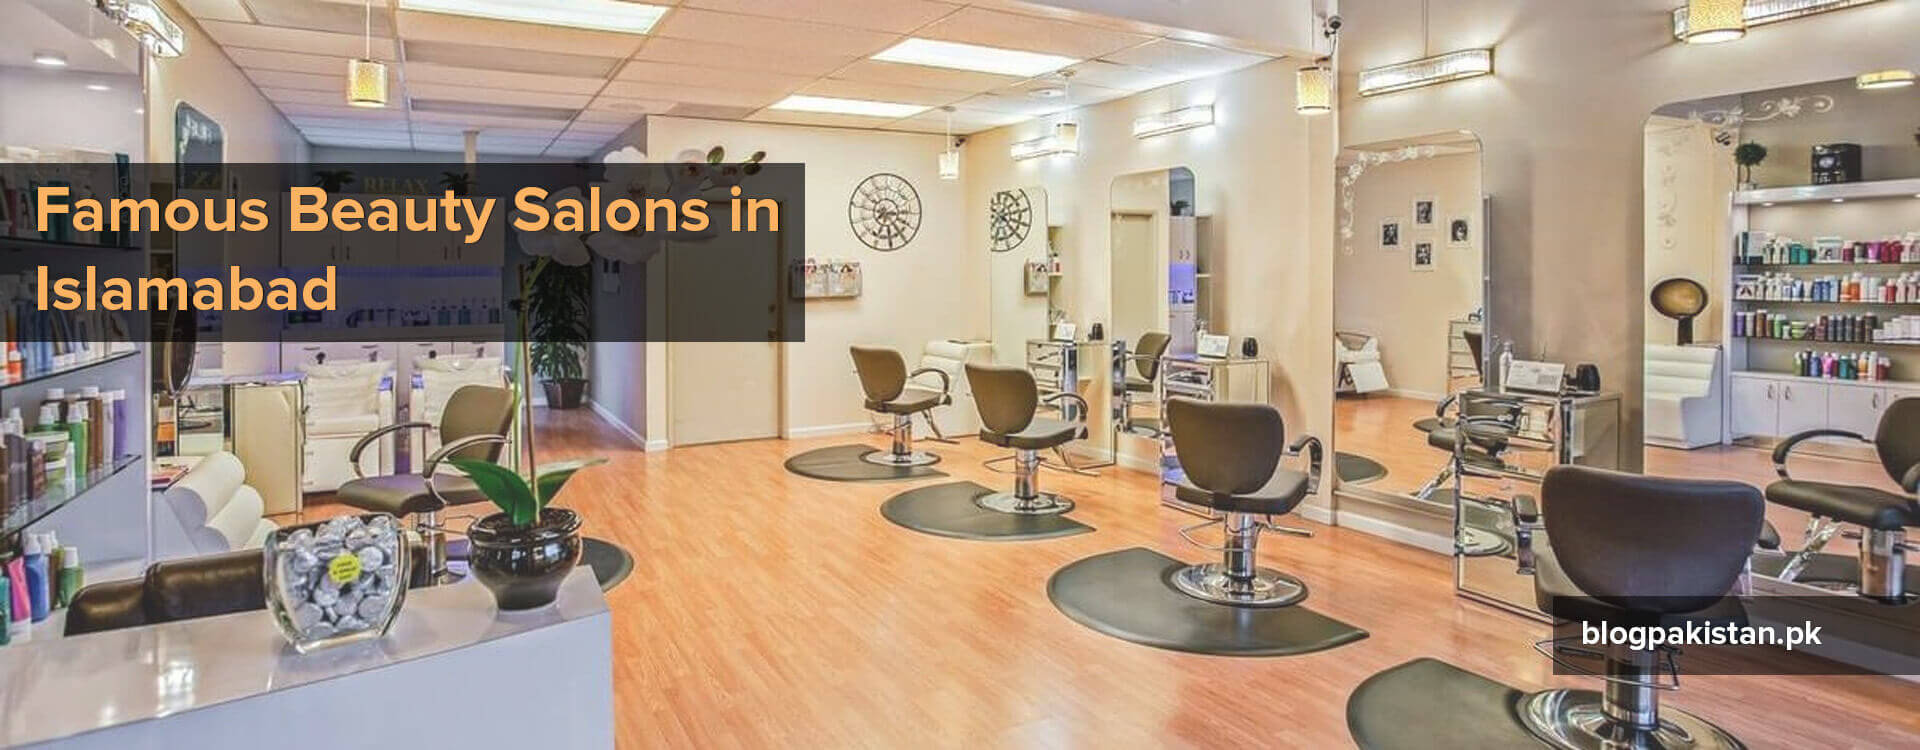 beauty salons in Islamabad